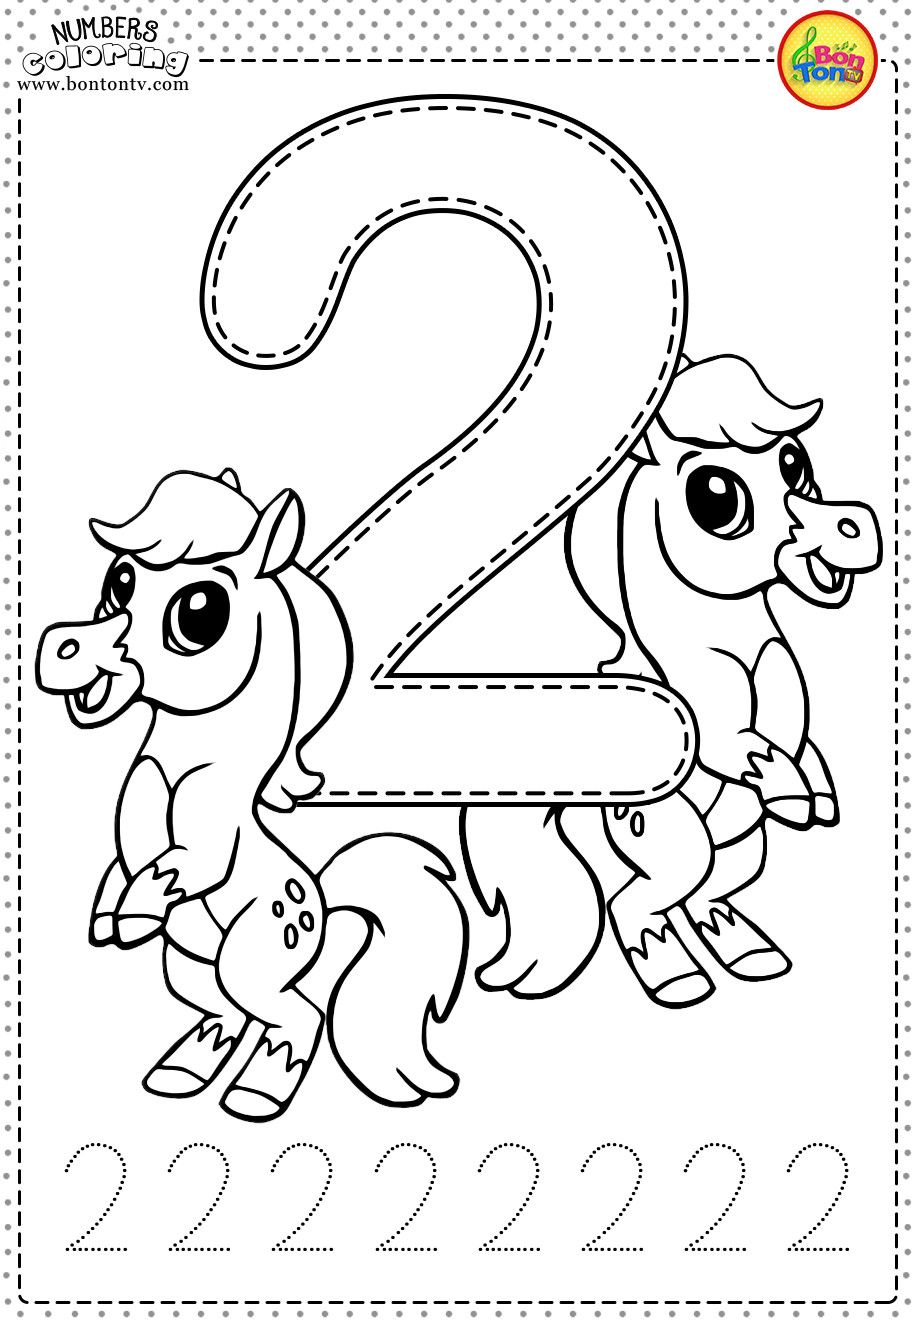 5 Alphabet Coloring Pages Free Kindergarten Number 2 Preschool Printables In 2020 Free Preschool Printables Preschool Worksheets Free Printables Kids Learning Numbers